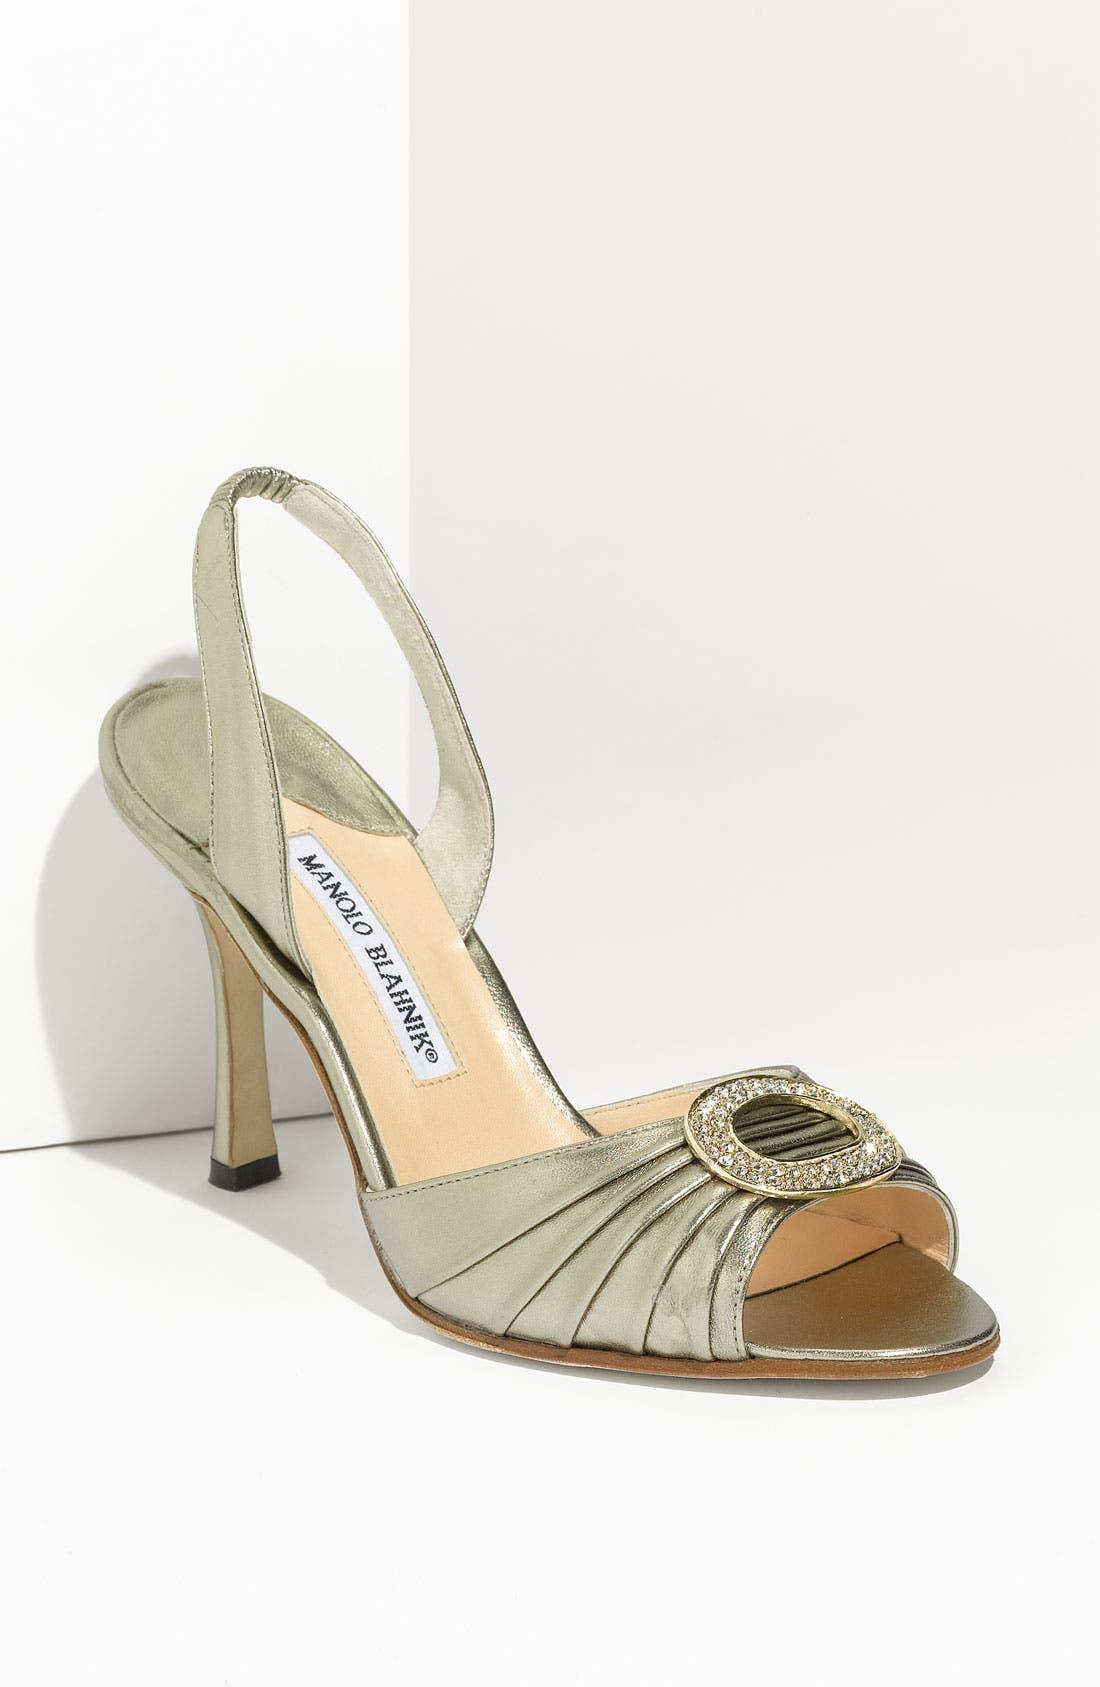 Alternate Image 1 Selected - Manolo Blahnik 'Sedaraby' Embellished Slingback Sandal